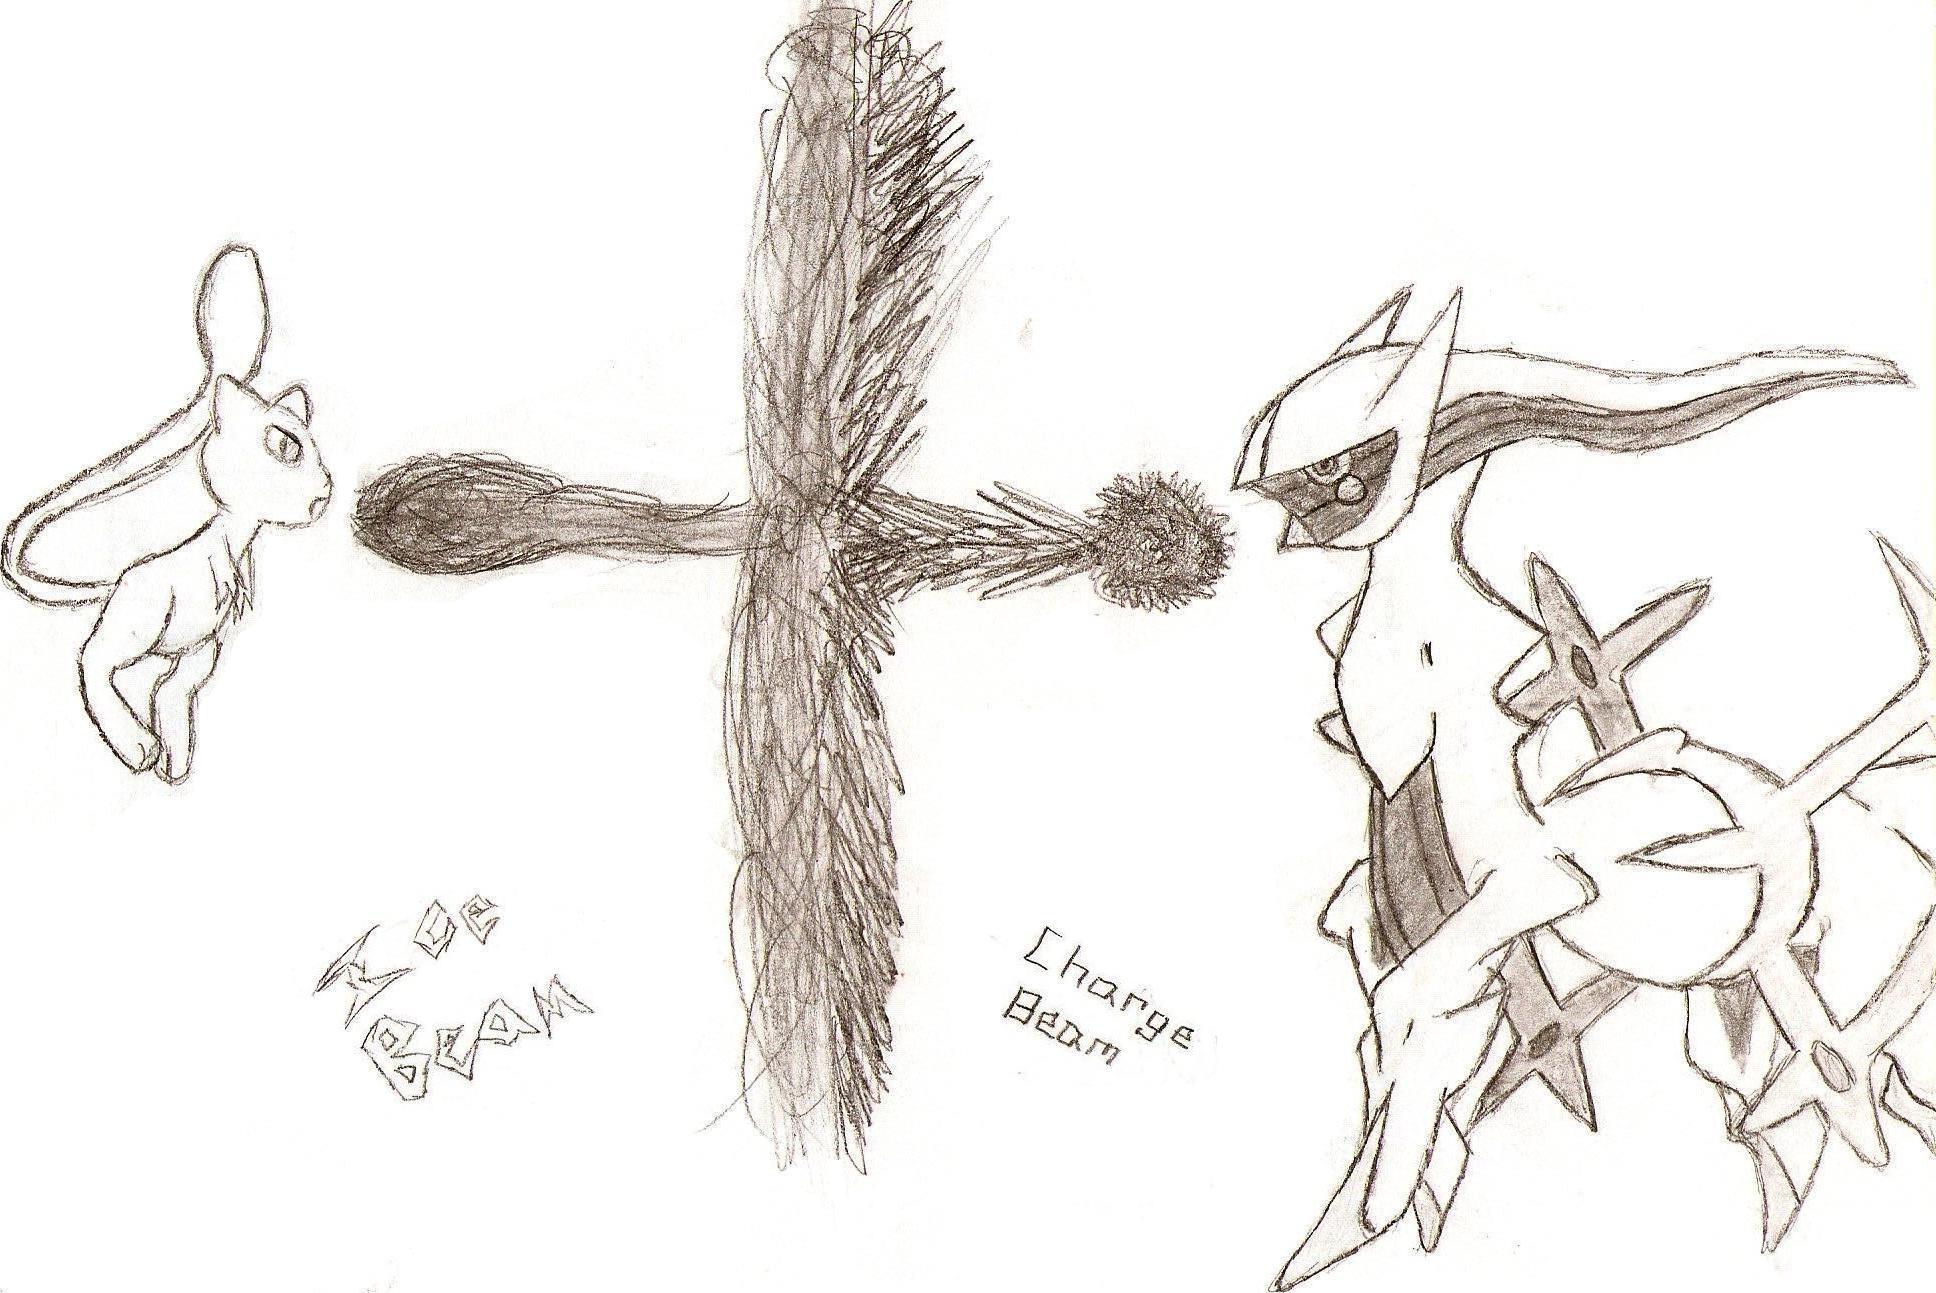 [Image: mew_vs__arceus_by_littlehowlingwolf-d4qb3h0.jpg]